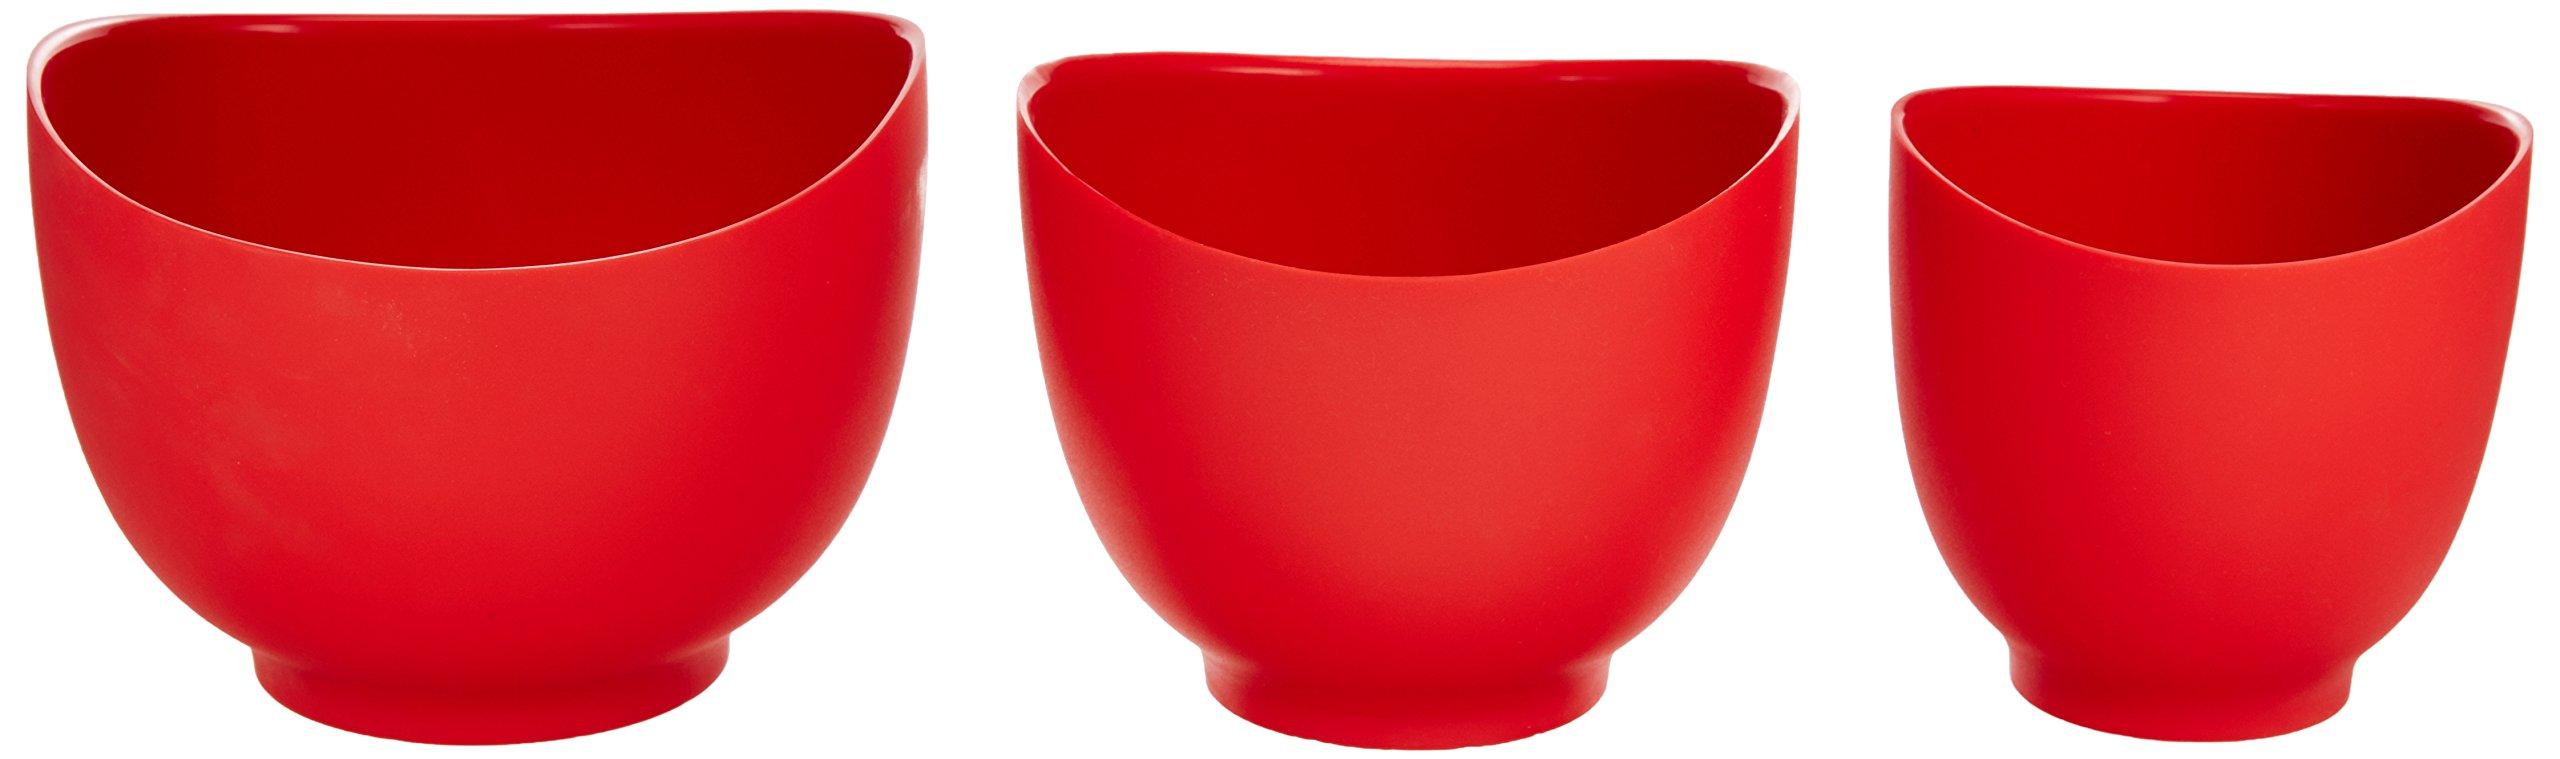 iSi Basics FlexibleSilicone Mixing Bowls, Set of 3, 1 QT, 1.5 QT, 2 QT, Red by iSi North America